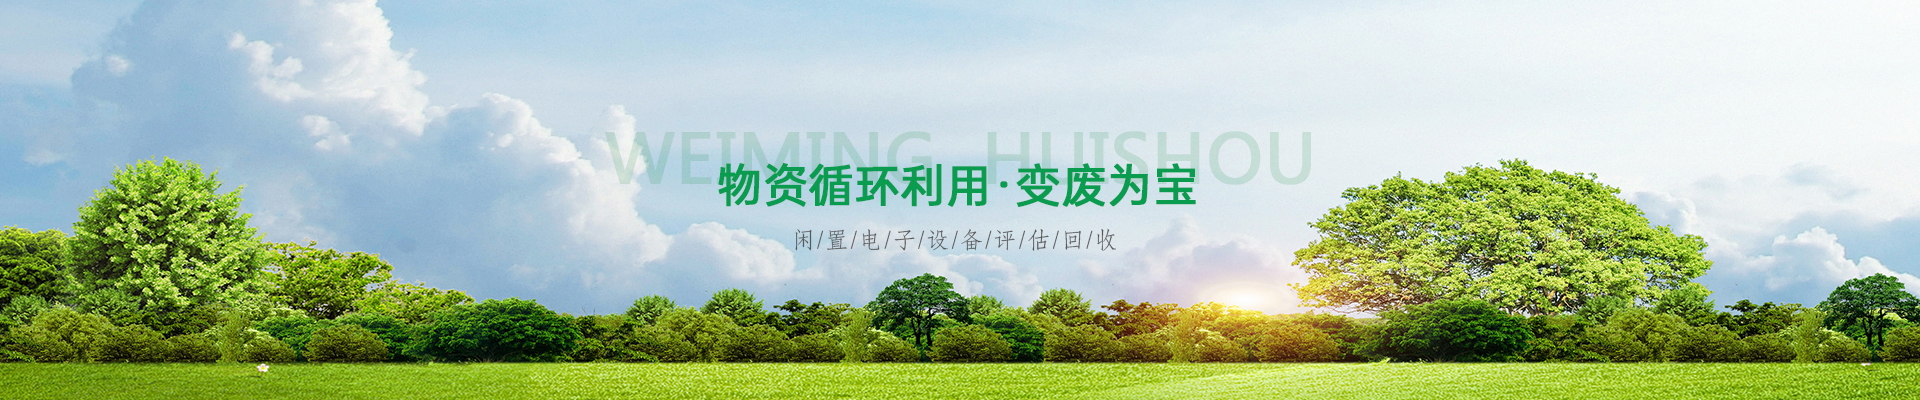 http://www.hongshenghuishou.com/data/upload/202011/20201110140939_198.jpg